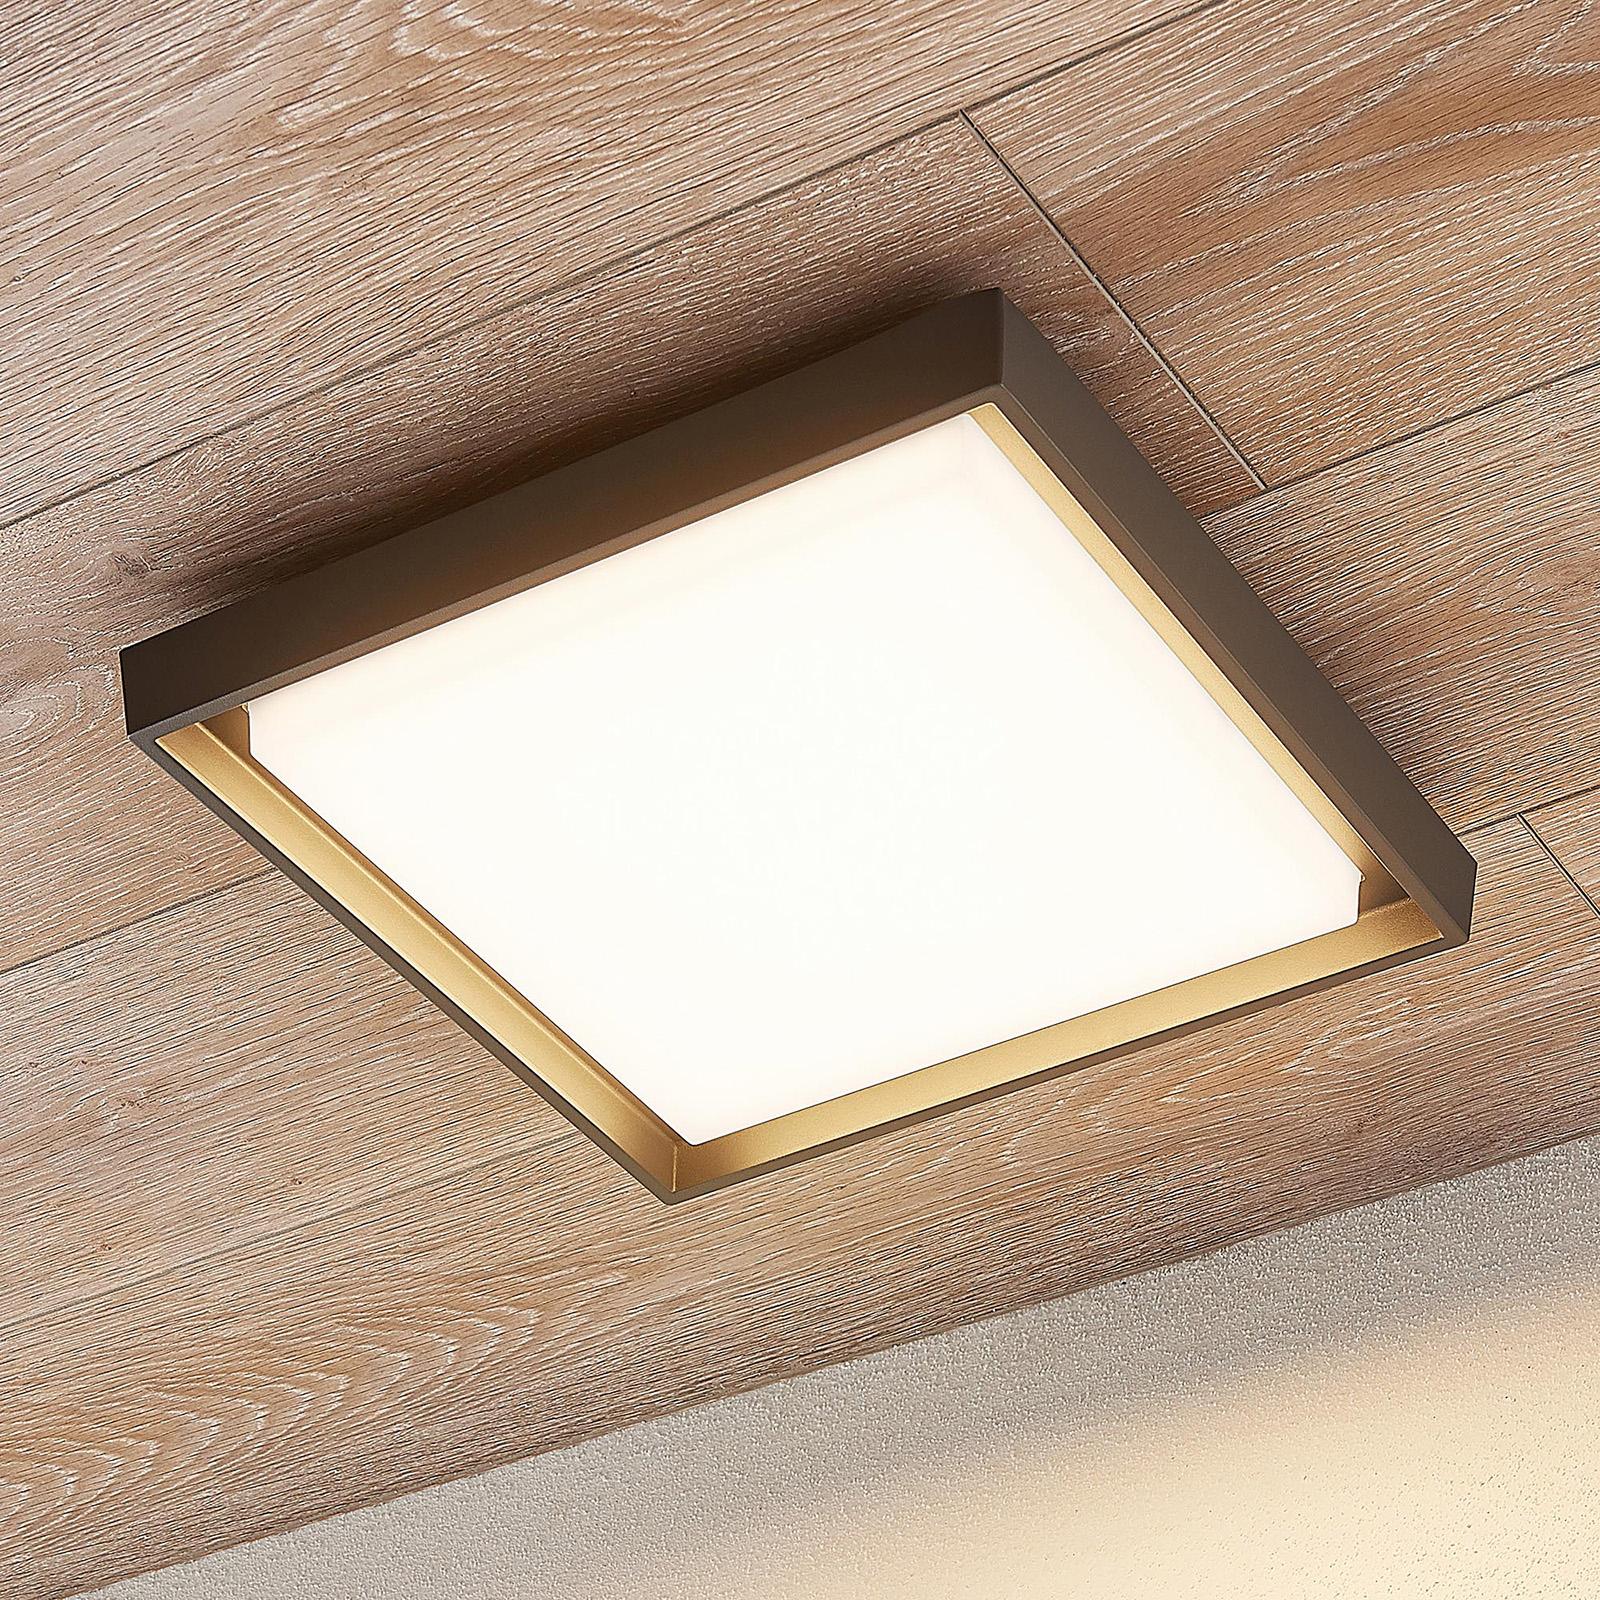 Lampa sufitowa LED Birta, kątowa, 34 cm